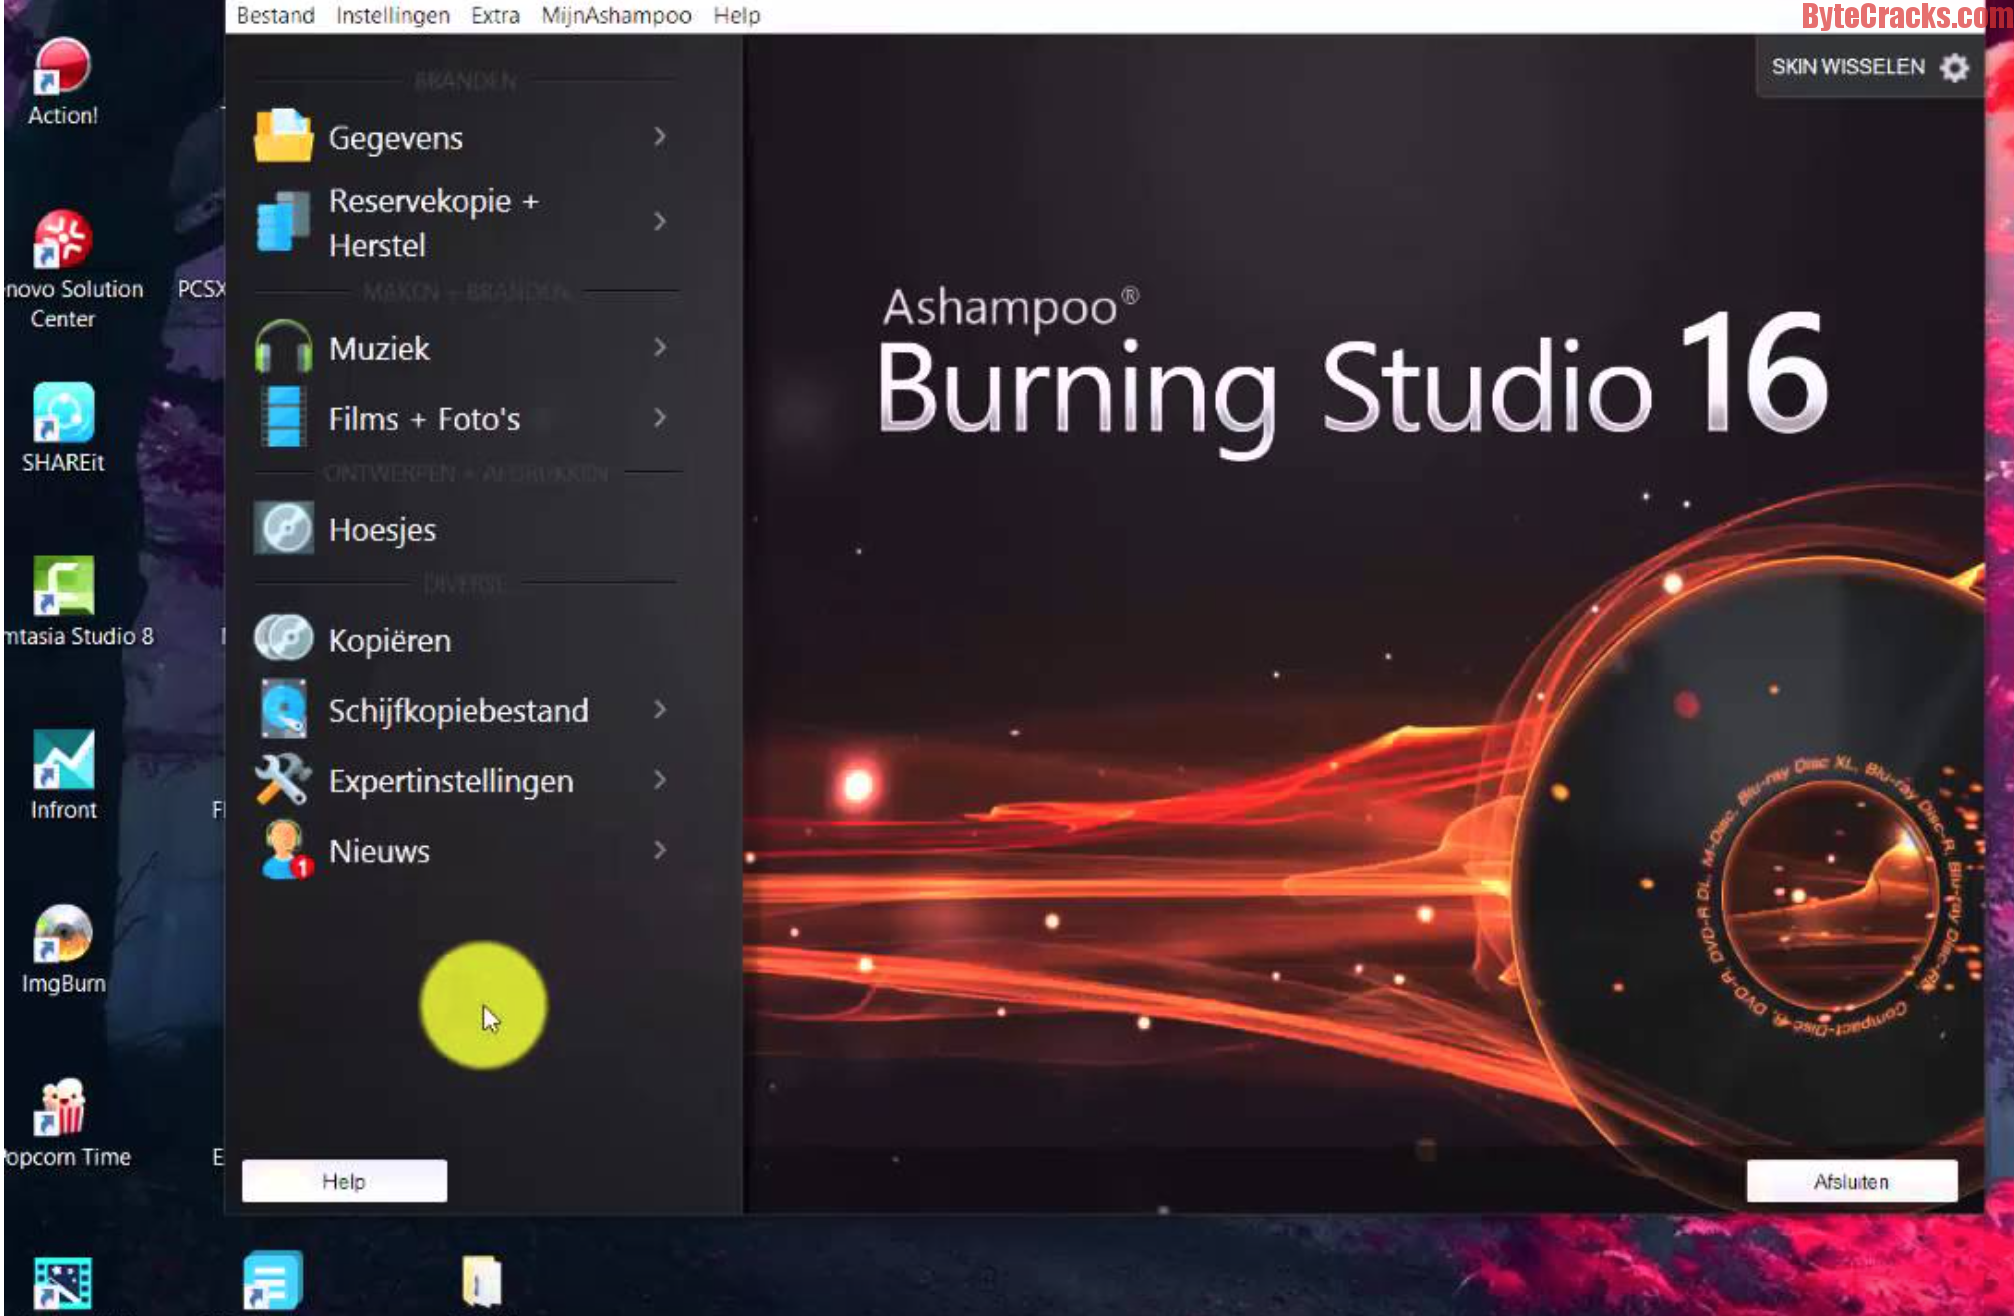 Ashampoo Burning Studio Free Download For Windows 7 32 Bit